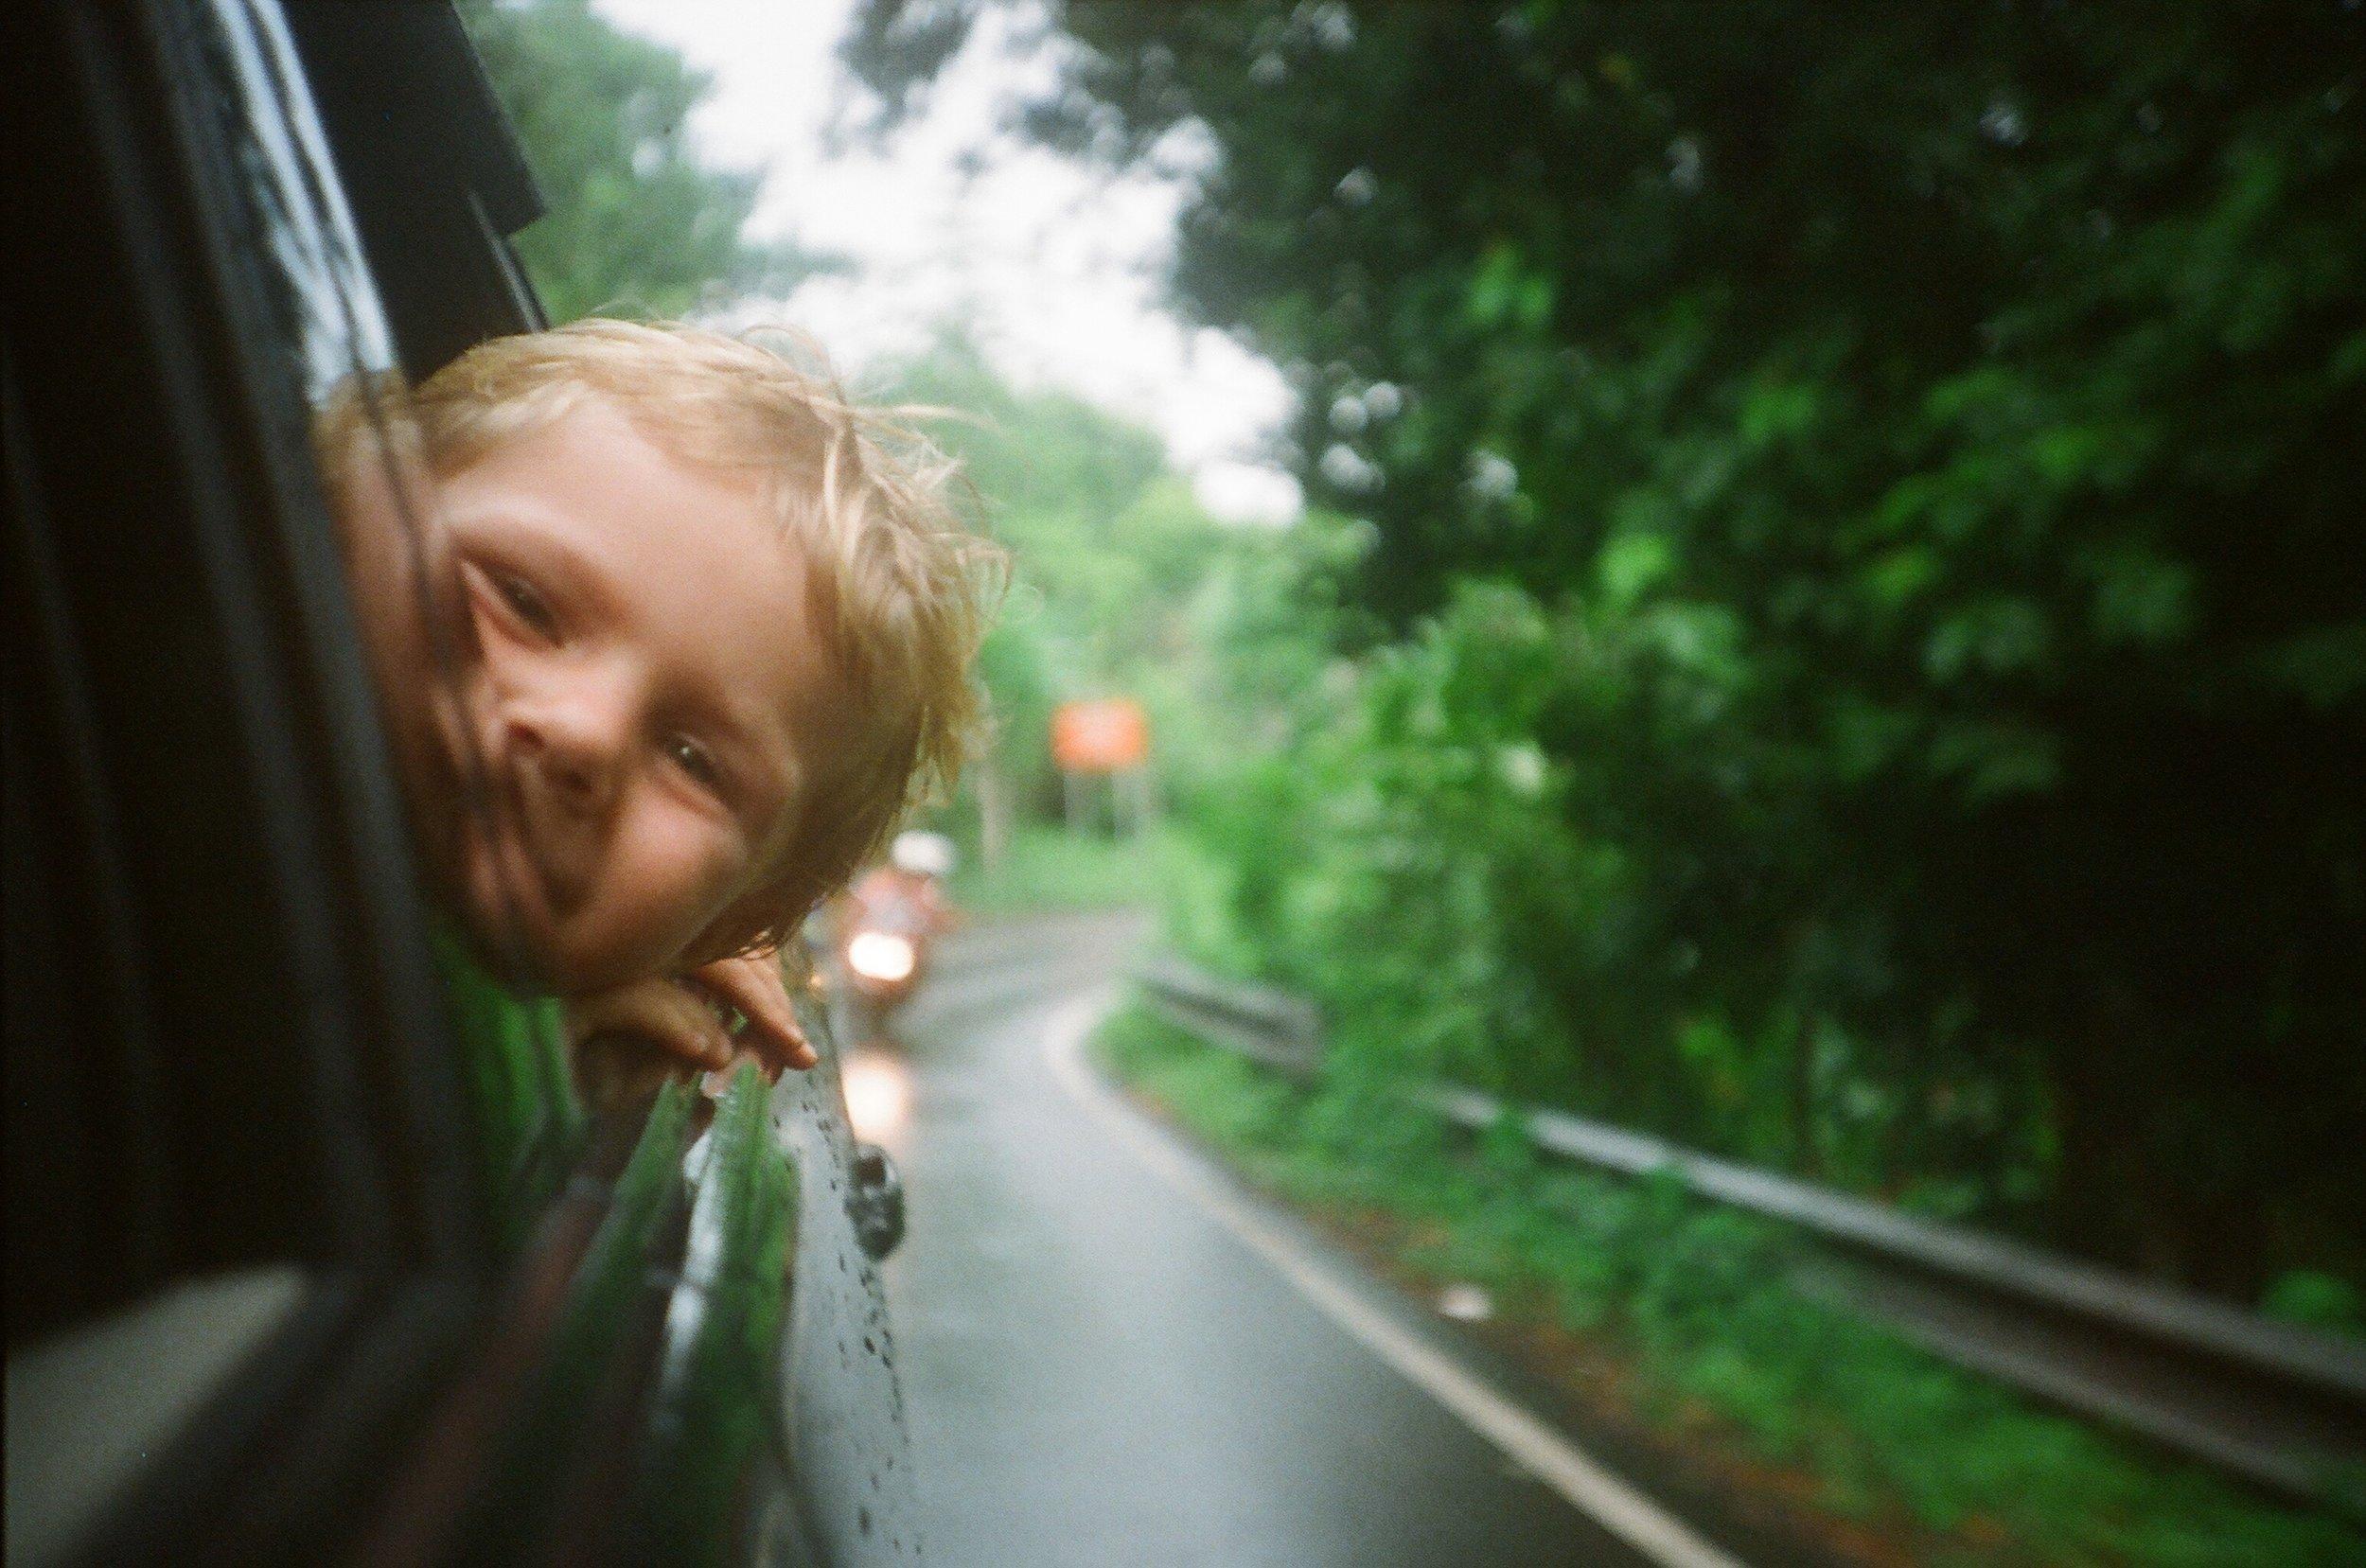 Support vocabulary, speech sound development, memory, and expressive/receptive language through car games.